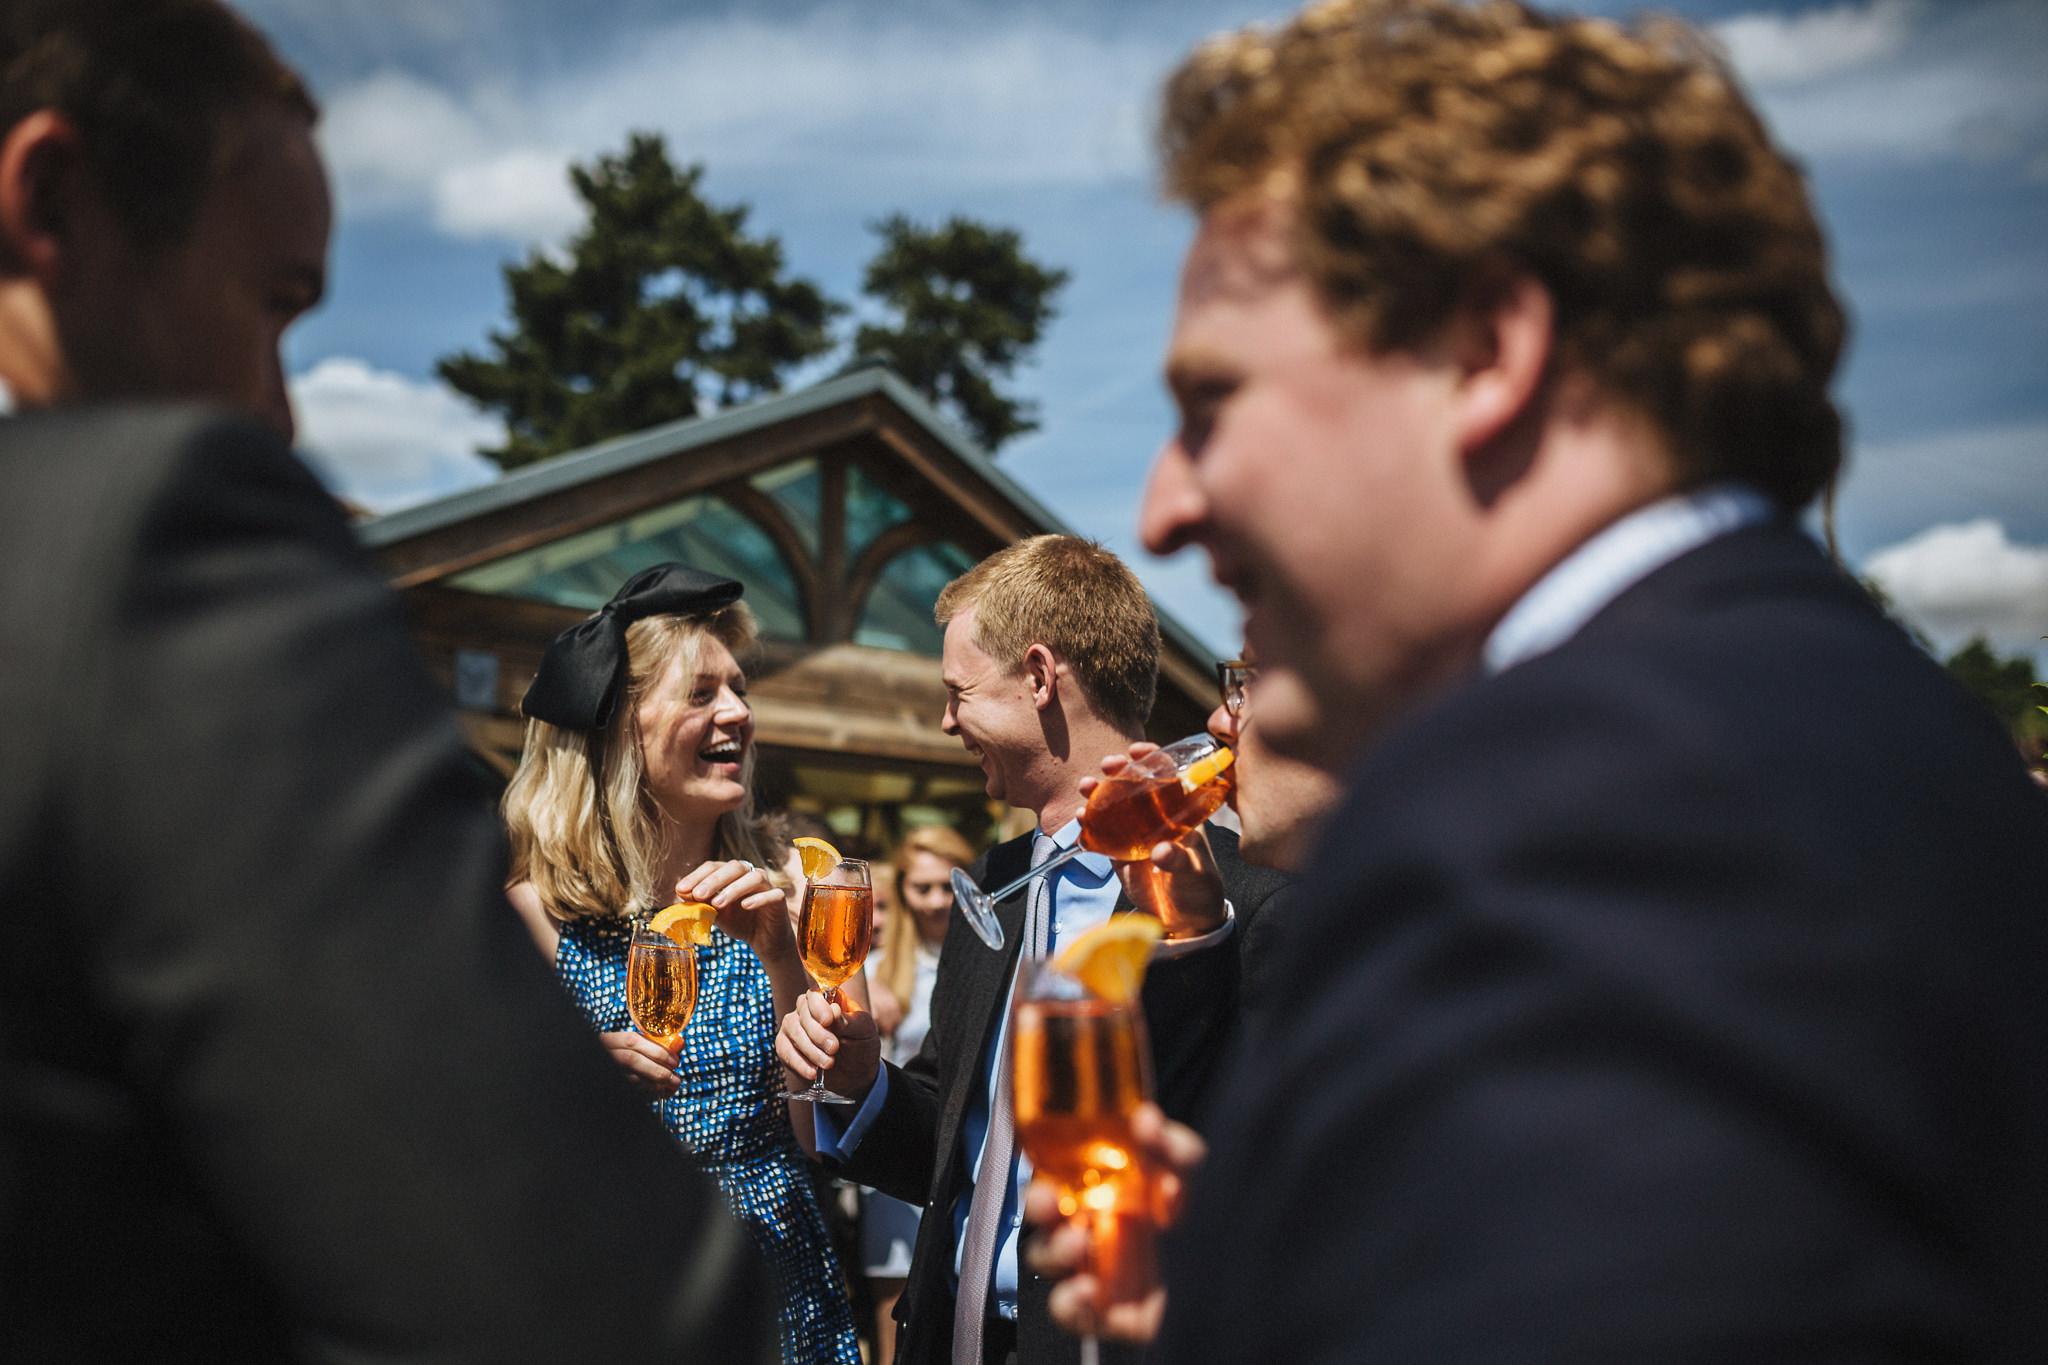 paul-marbrook-Gaynes-Park Wedding-Photographer-90059